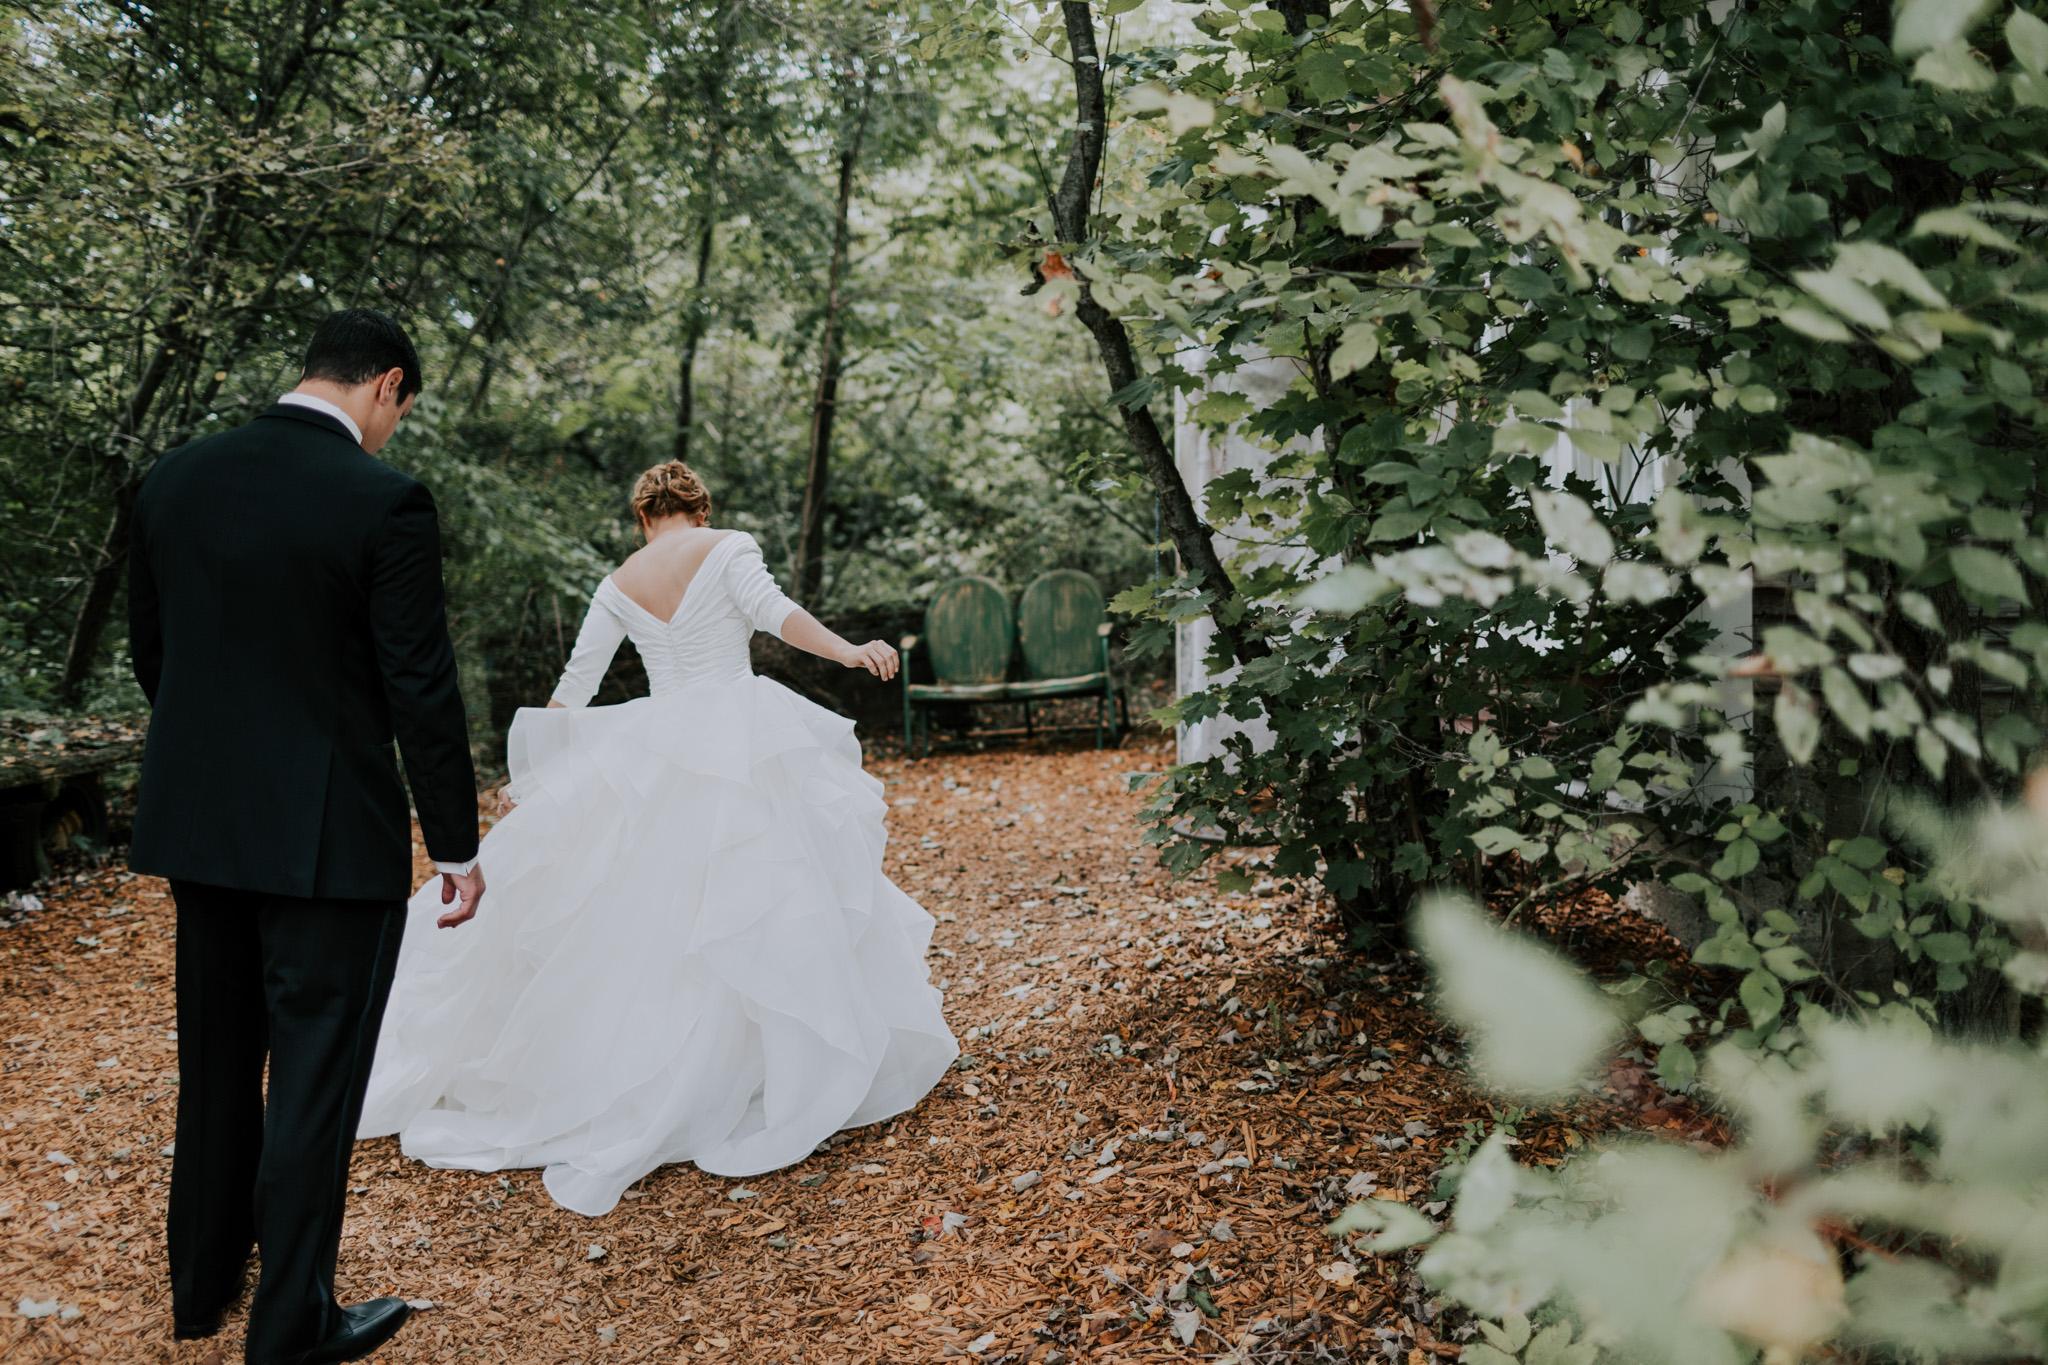 MillCreek-Wilde-Wedding-Barn-Michigan-Eliza-Eric-Vafa-Photo302.jpg